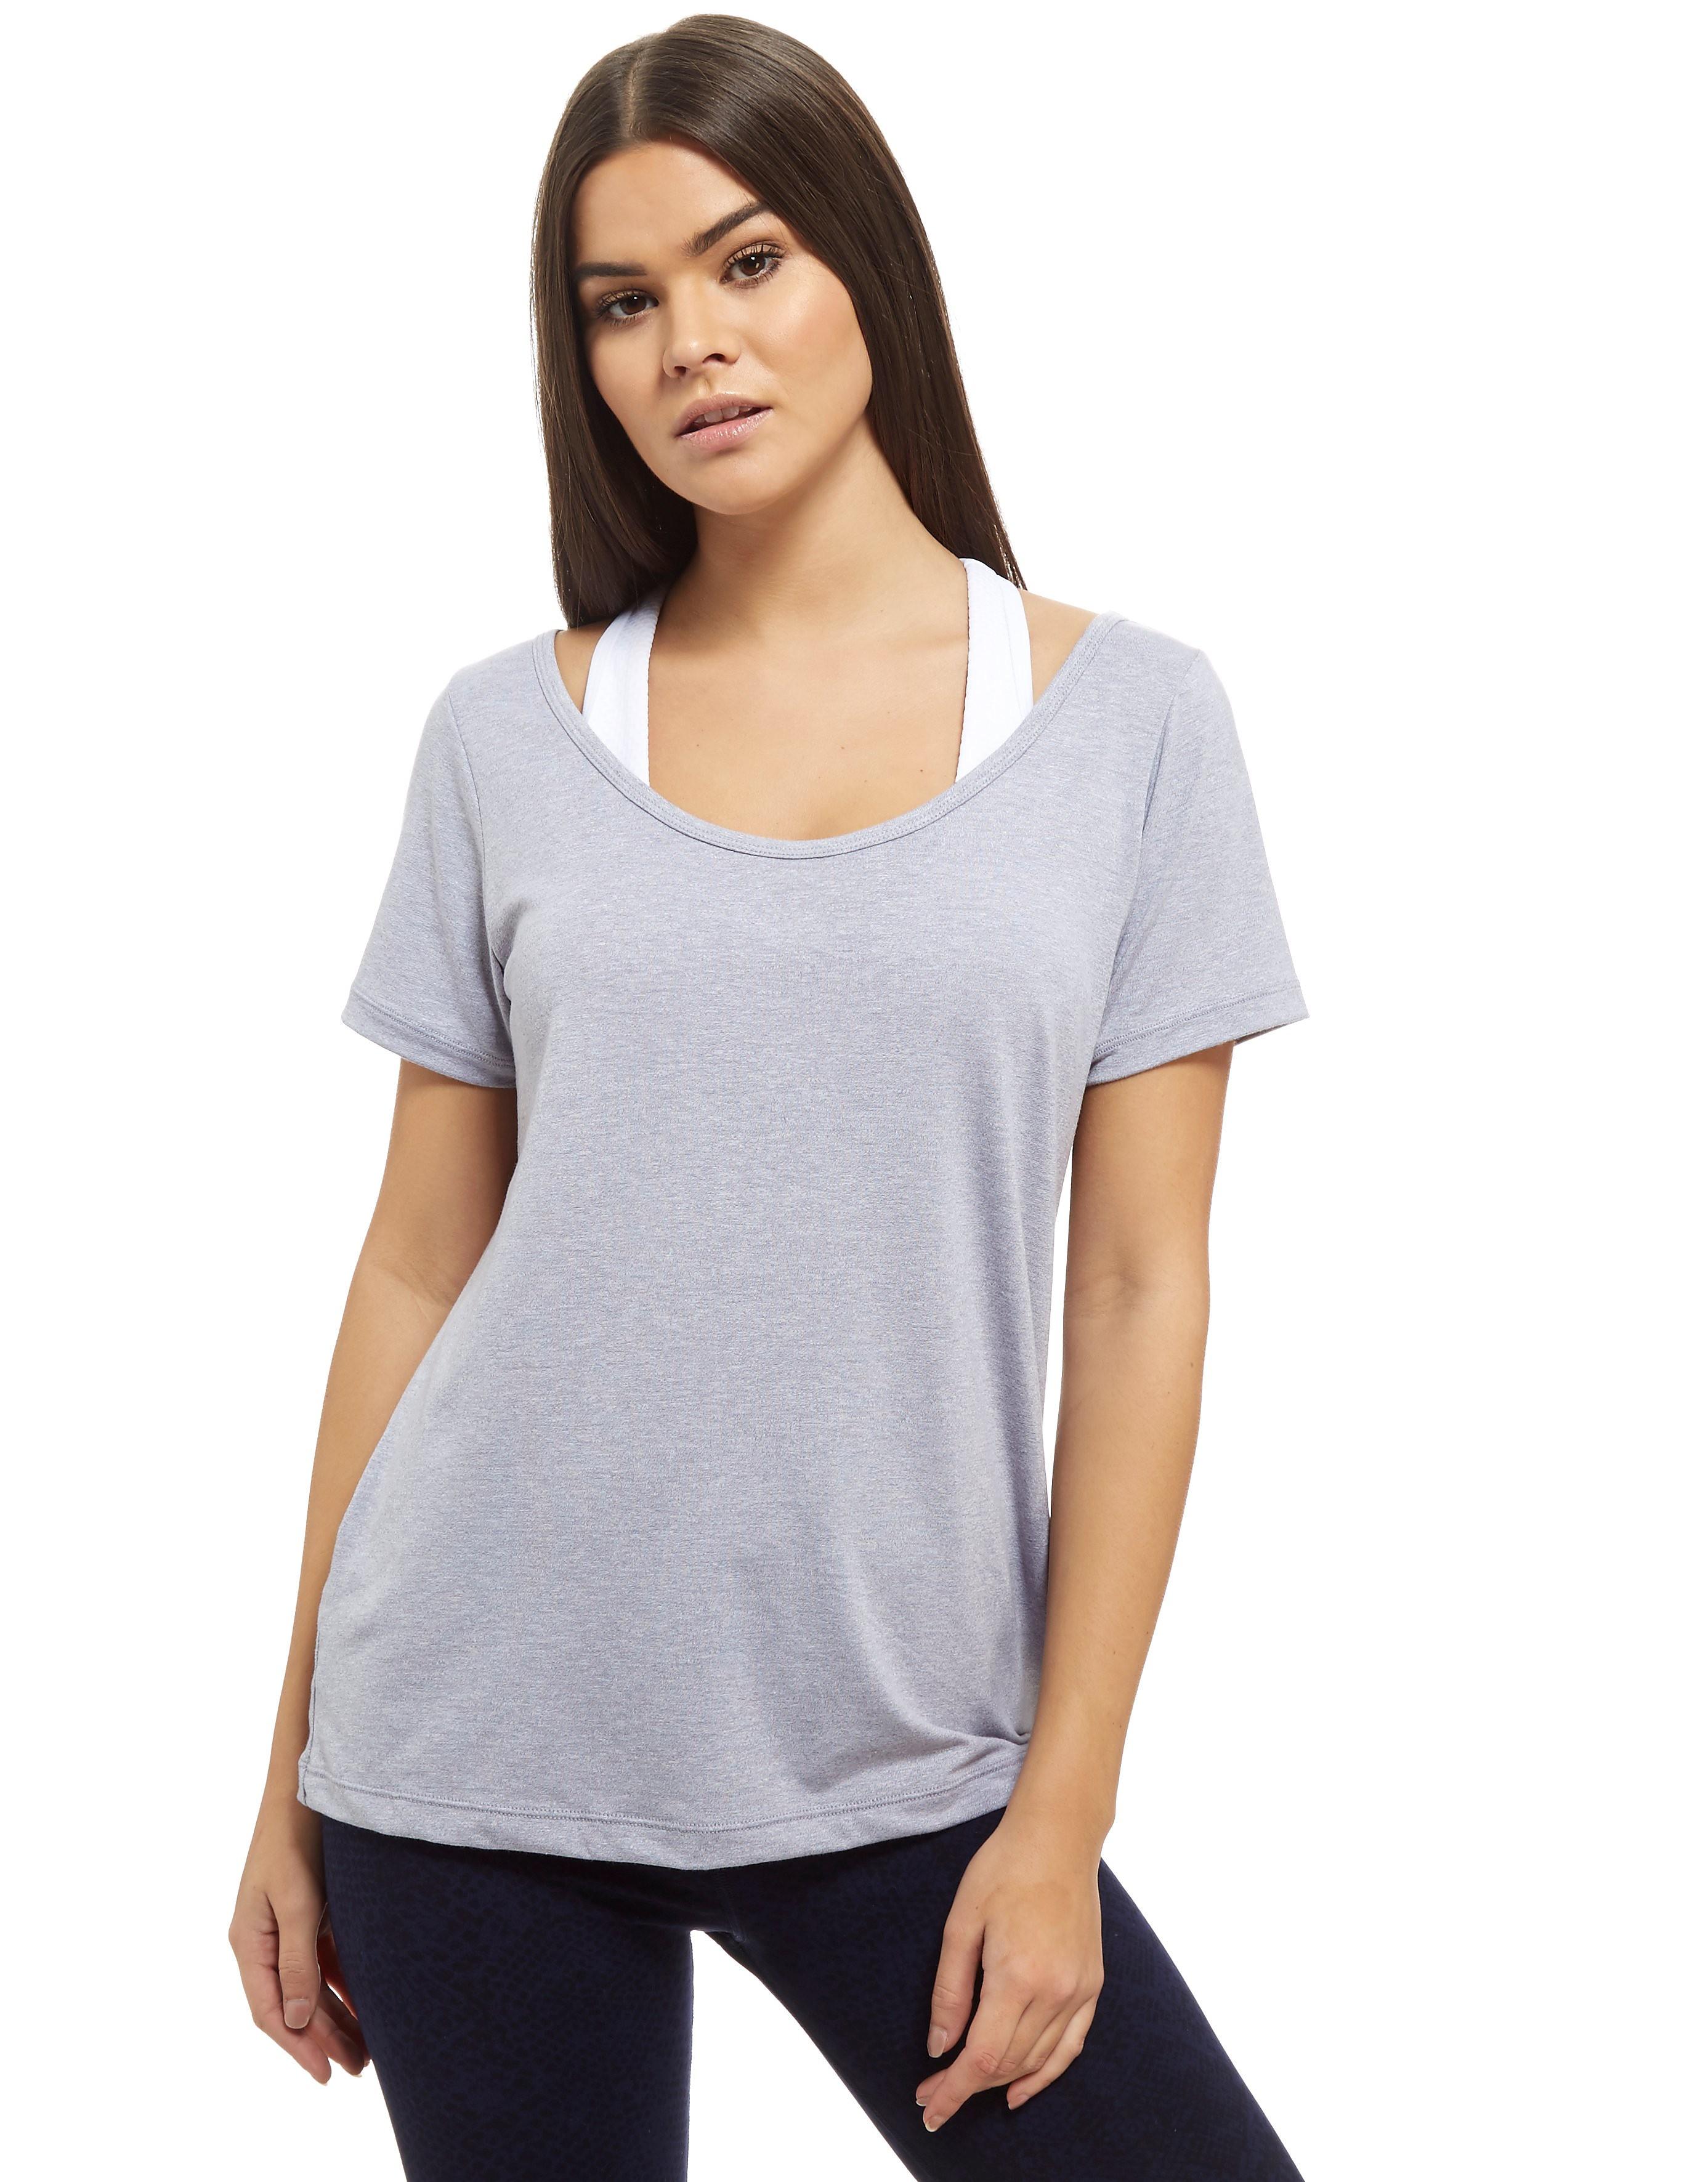 Lorna Jane Breathe Easy Active T-Shirt